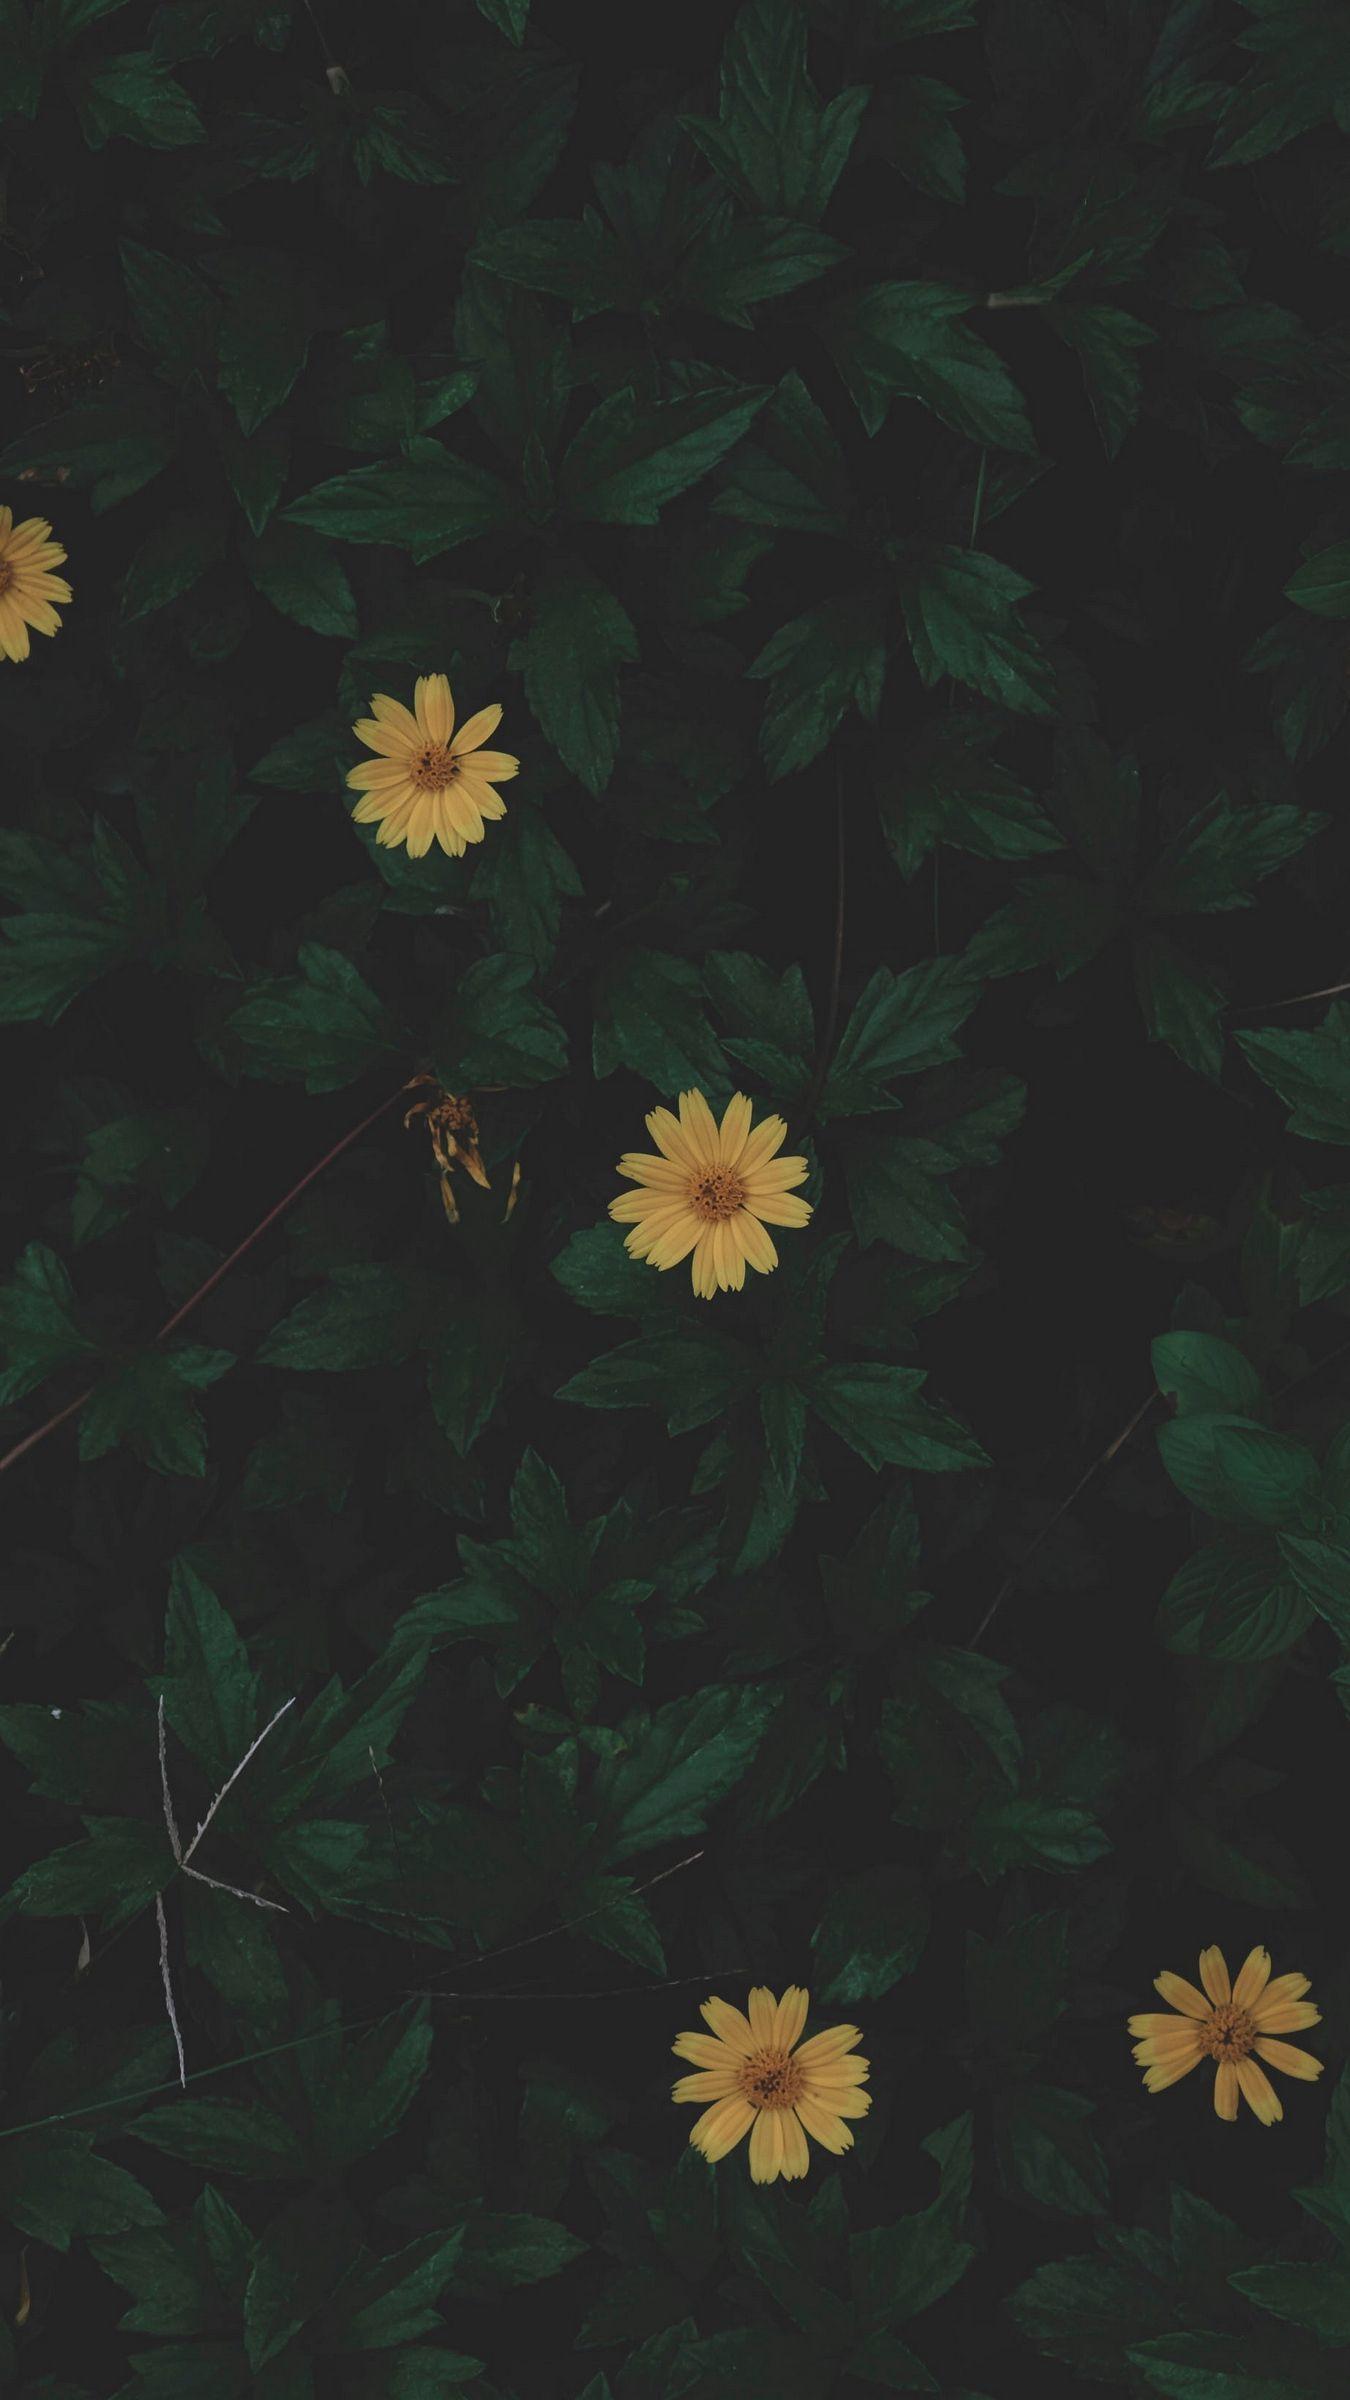 Dark Green iPhone Wallpapers - Wallpaper Cave